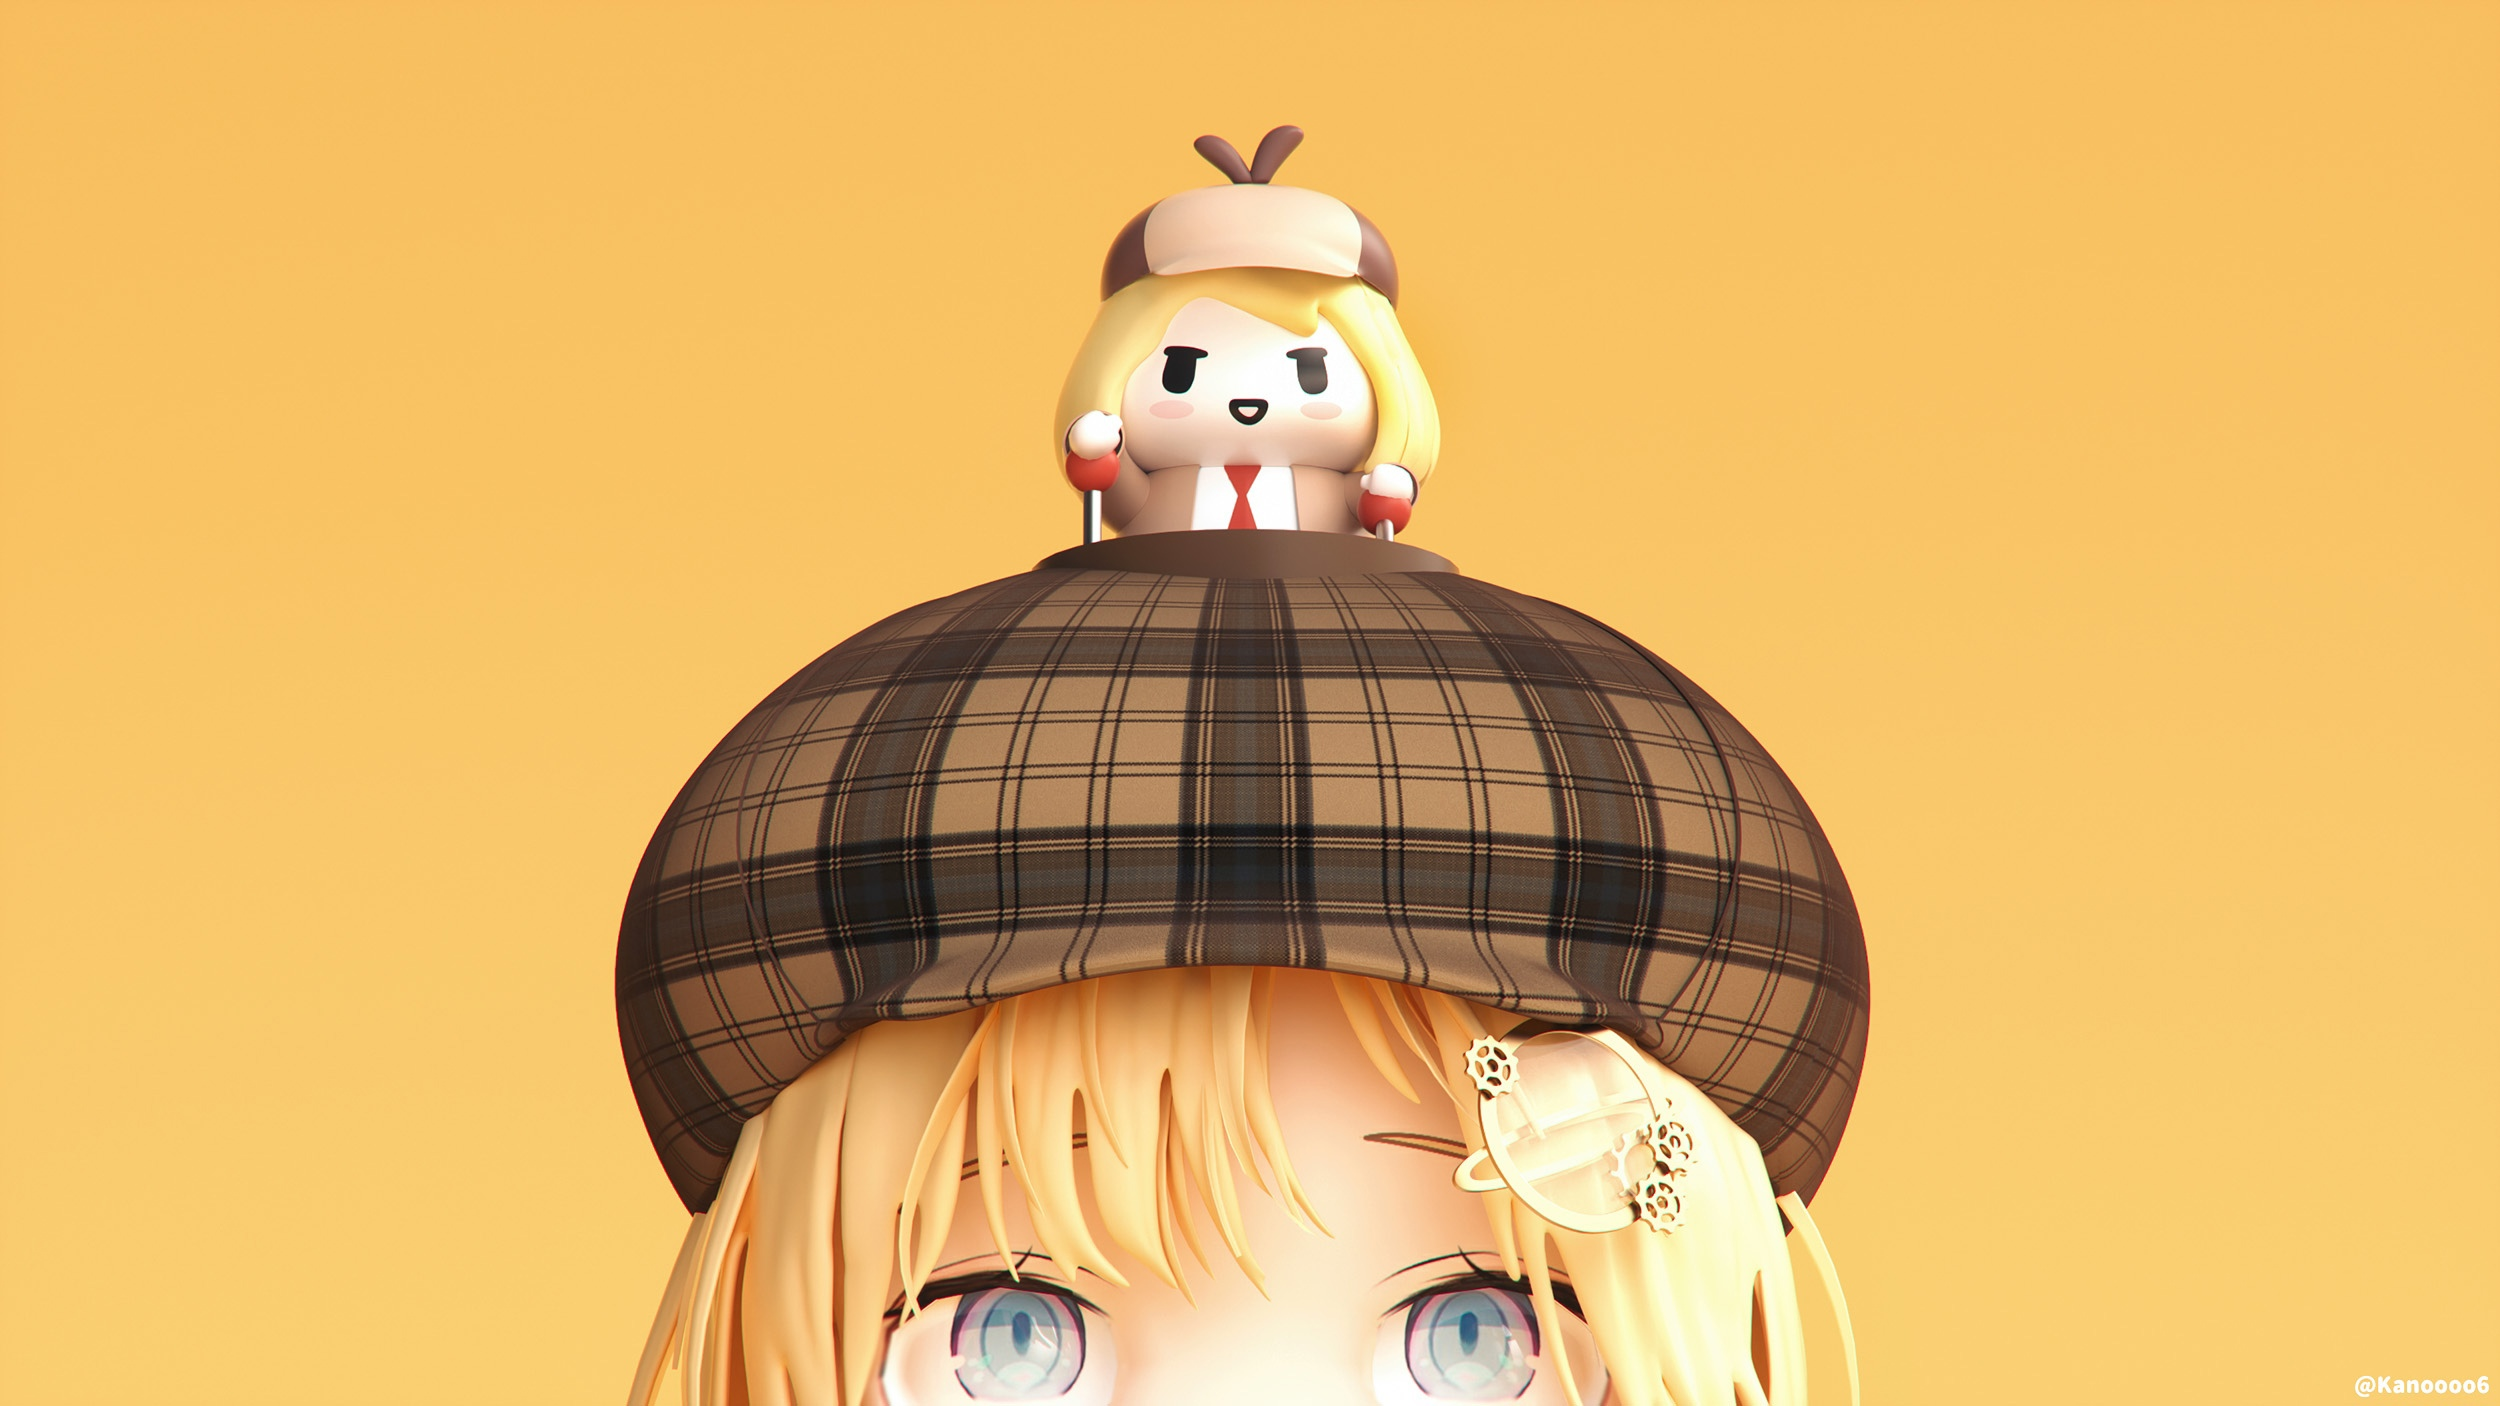 Anime 2500x1406 Hololive yellow hair bangs blue eyes hat yellow background monocles Watson Amelia